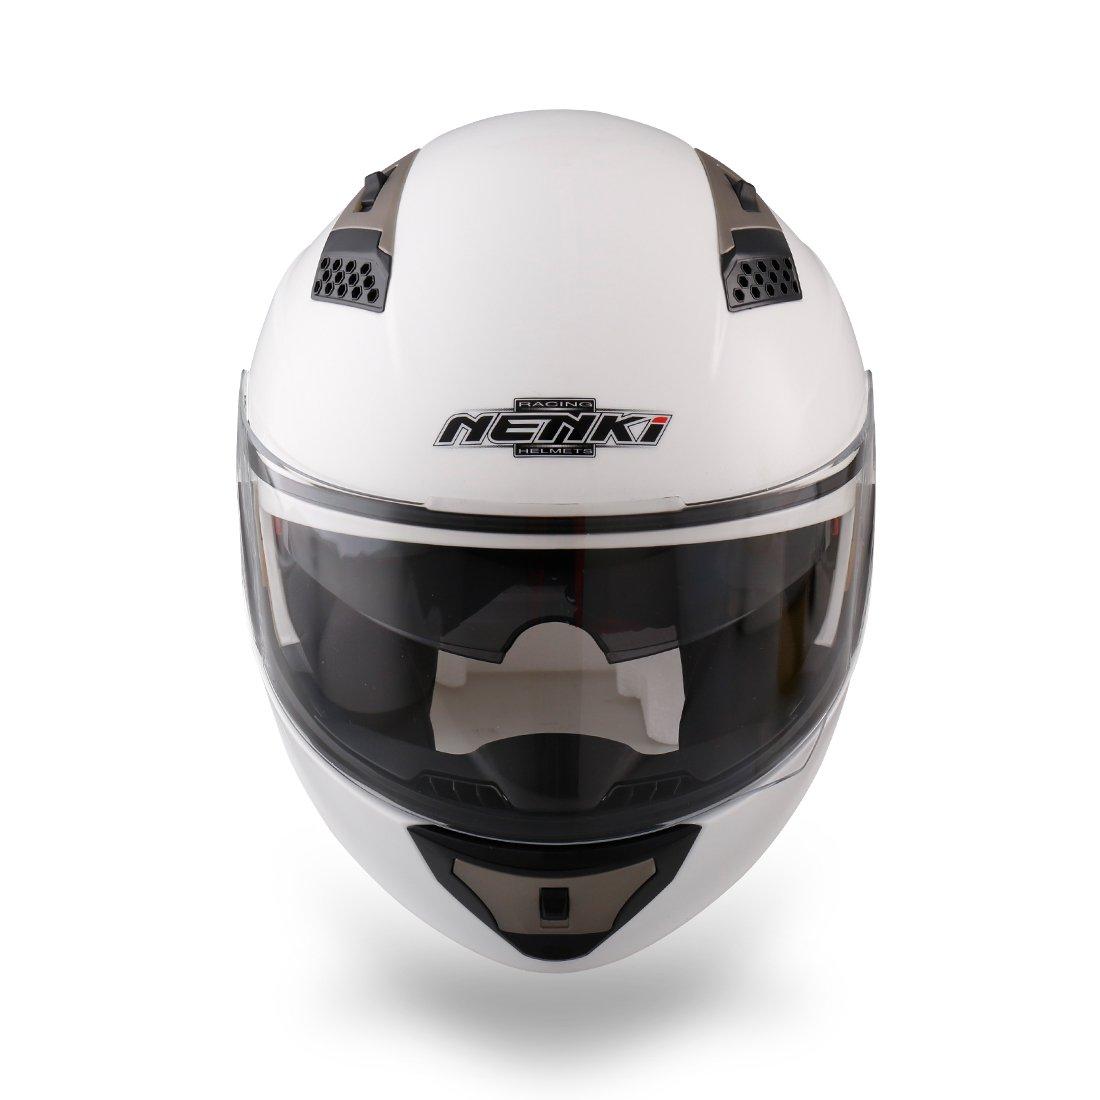 XGro/ß,Schwarz) NENKI NK-860 klapphelm f/ür Motorrad Moped Roller